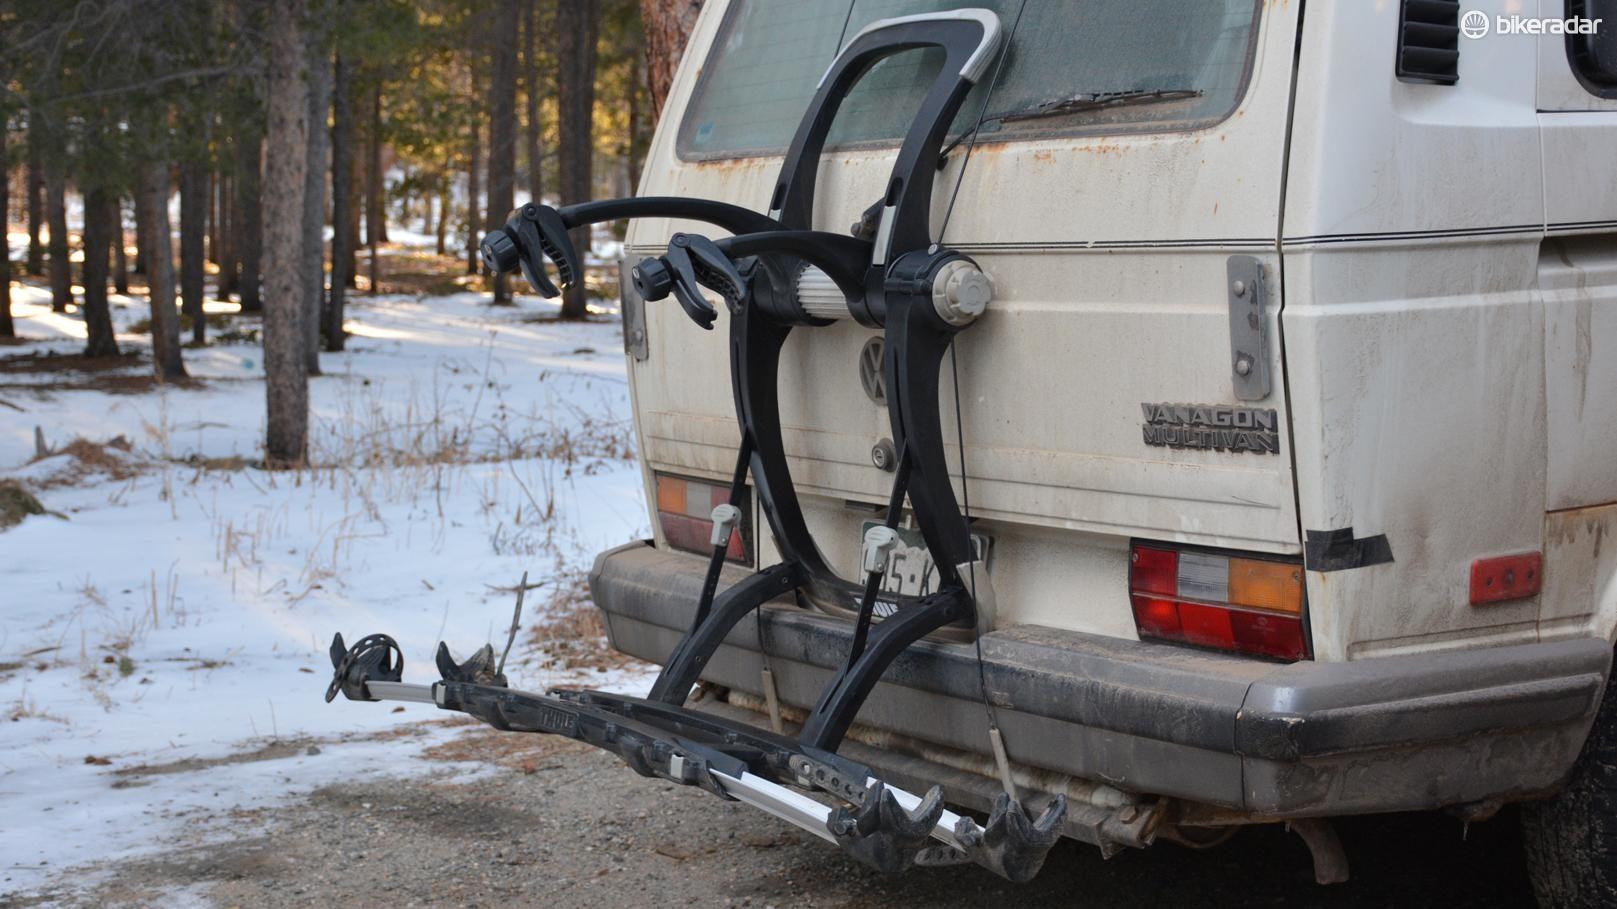 Saris Bones 3-Bike Car Rack Centre Strap Black